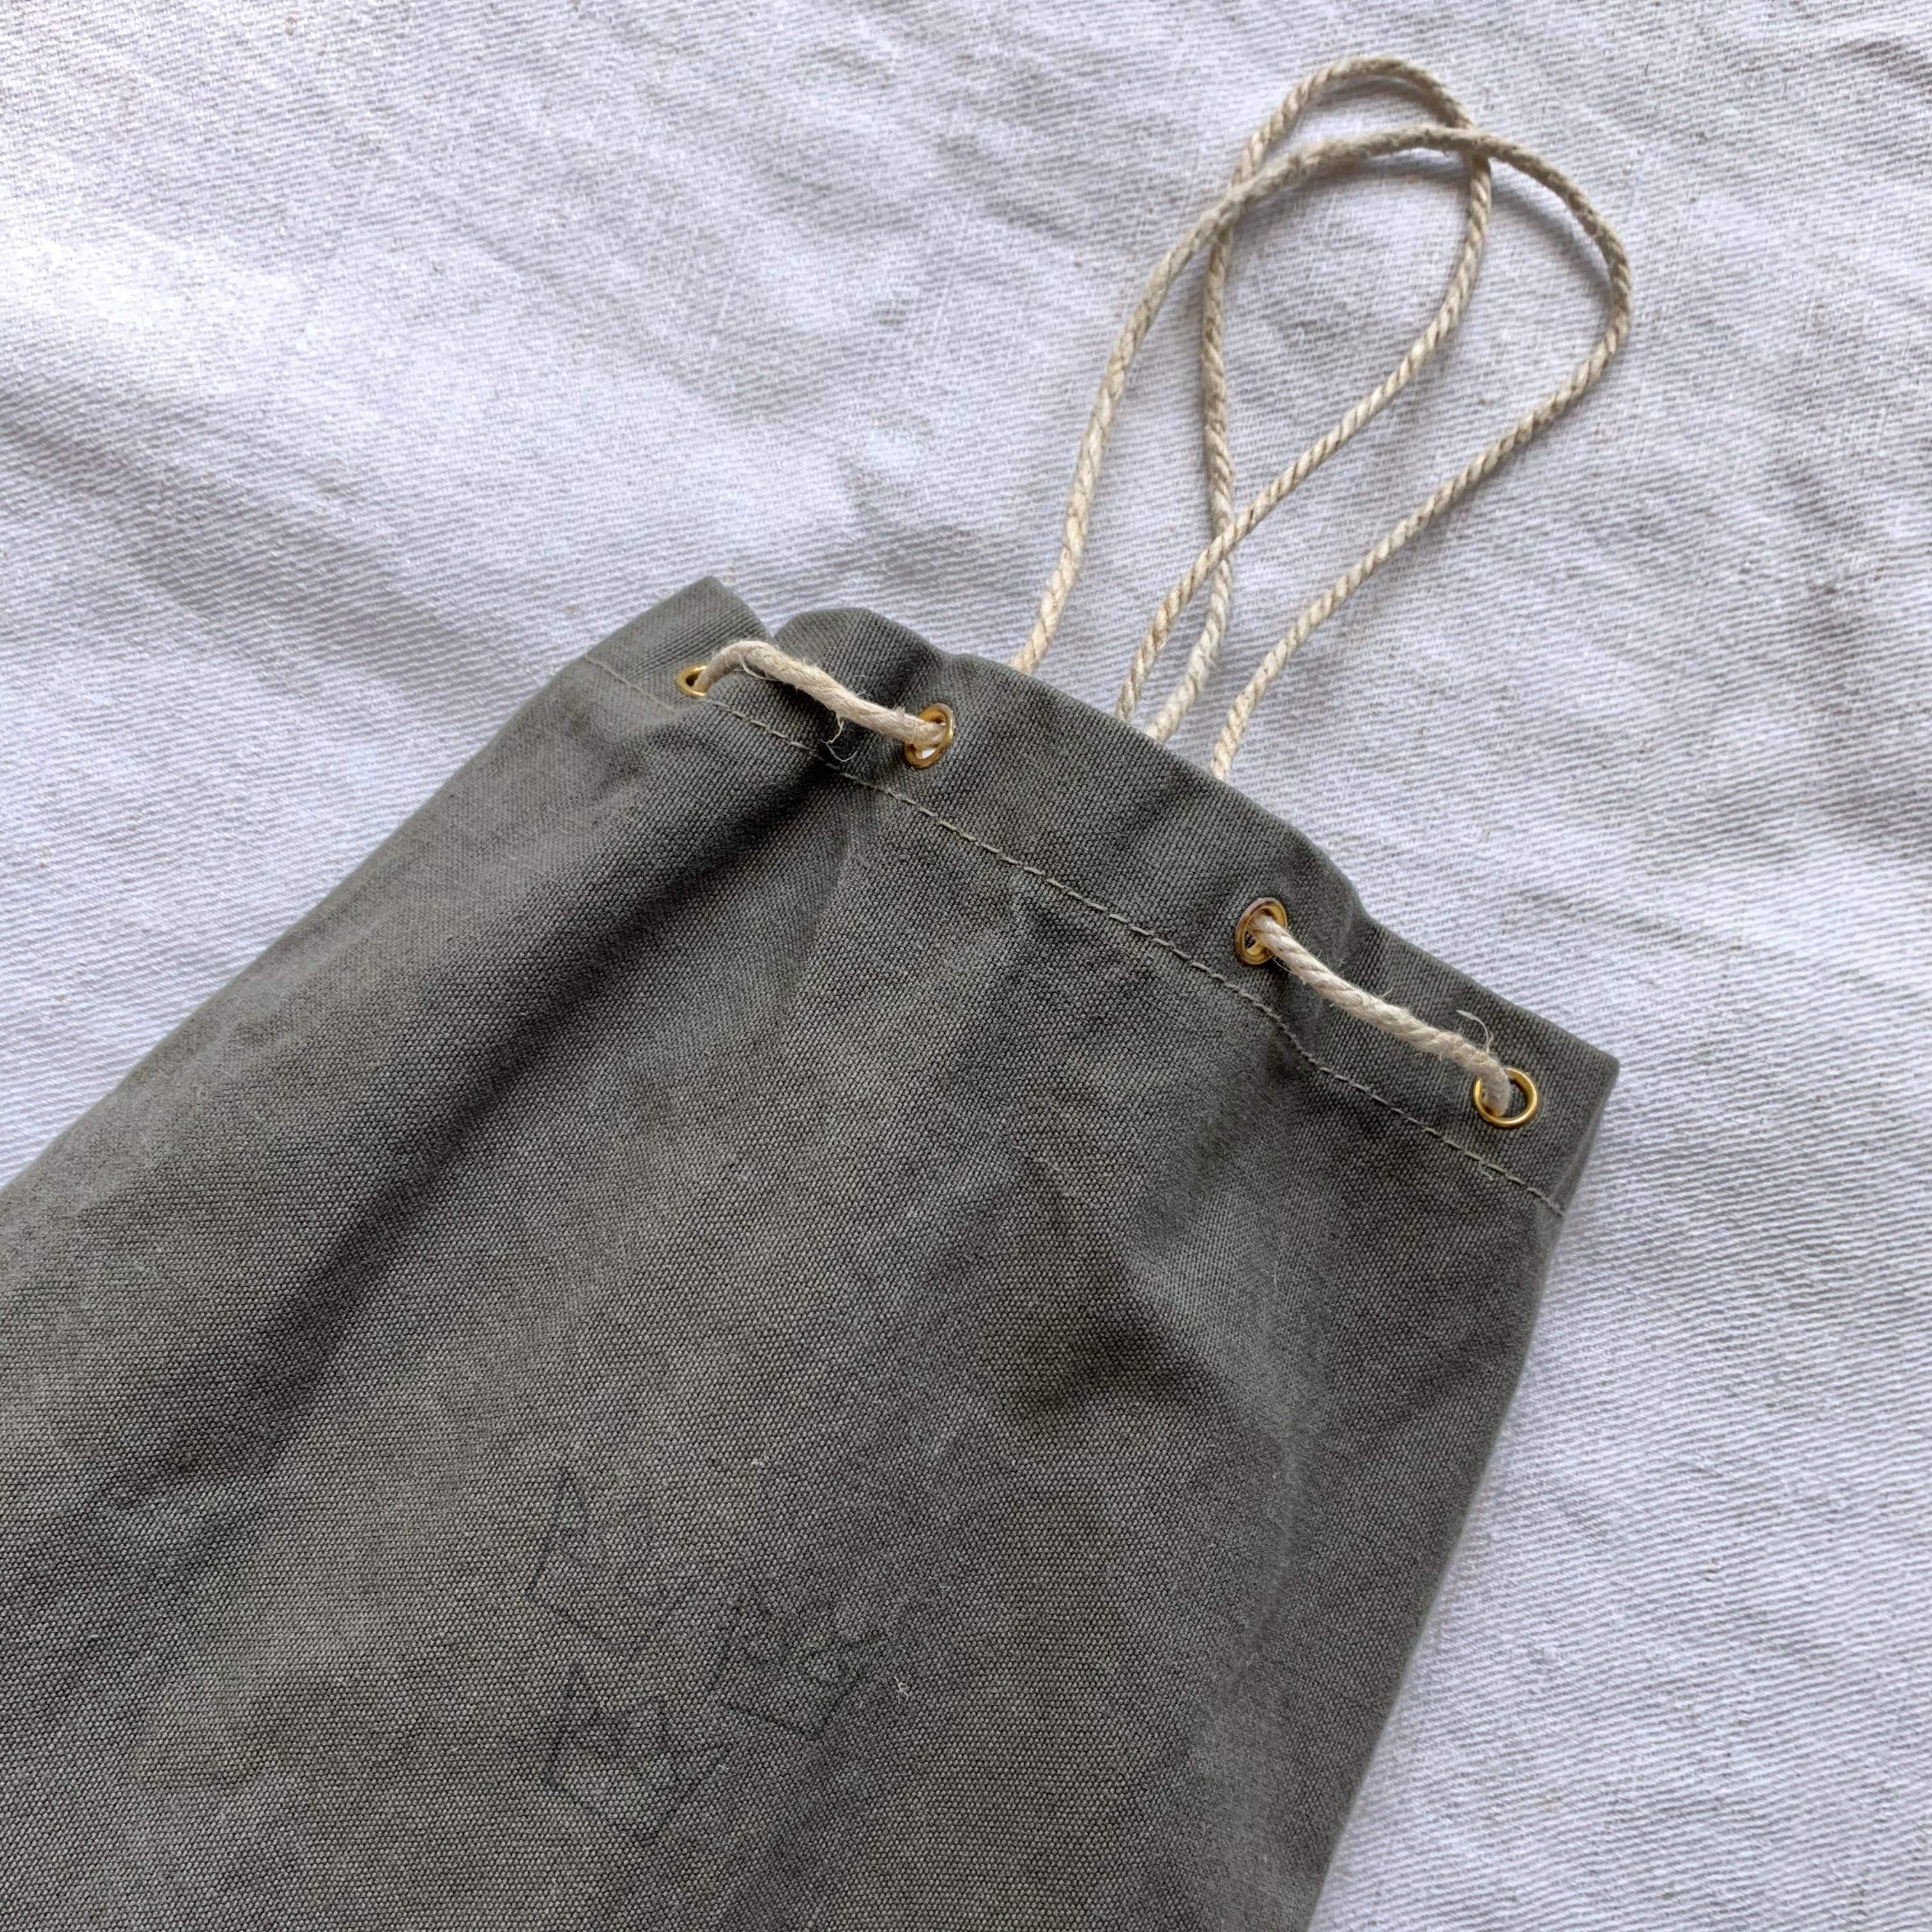 Swedish Military Laundry Bag[B]